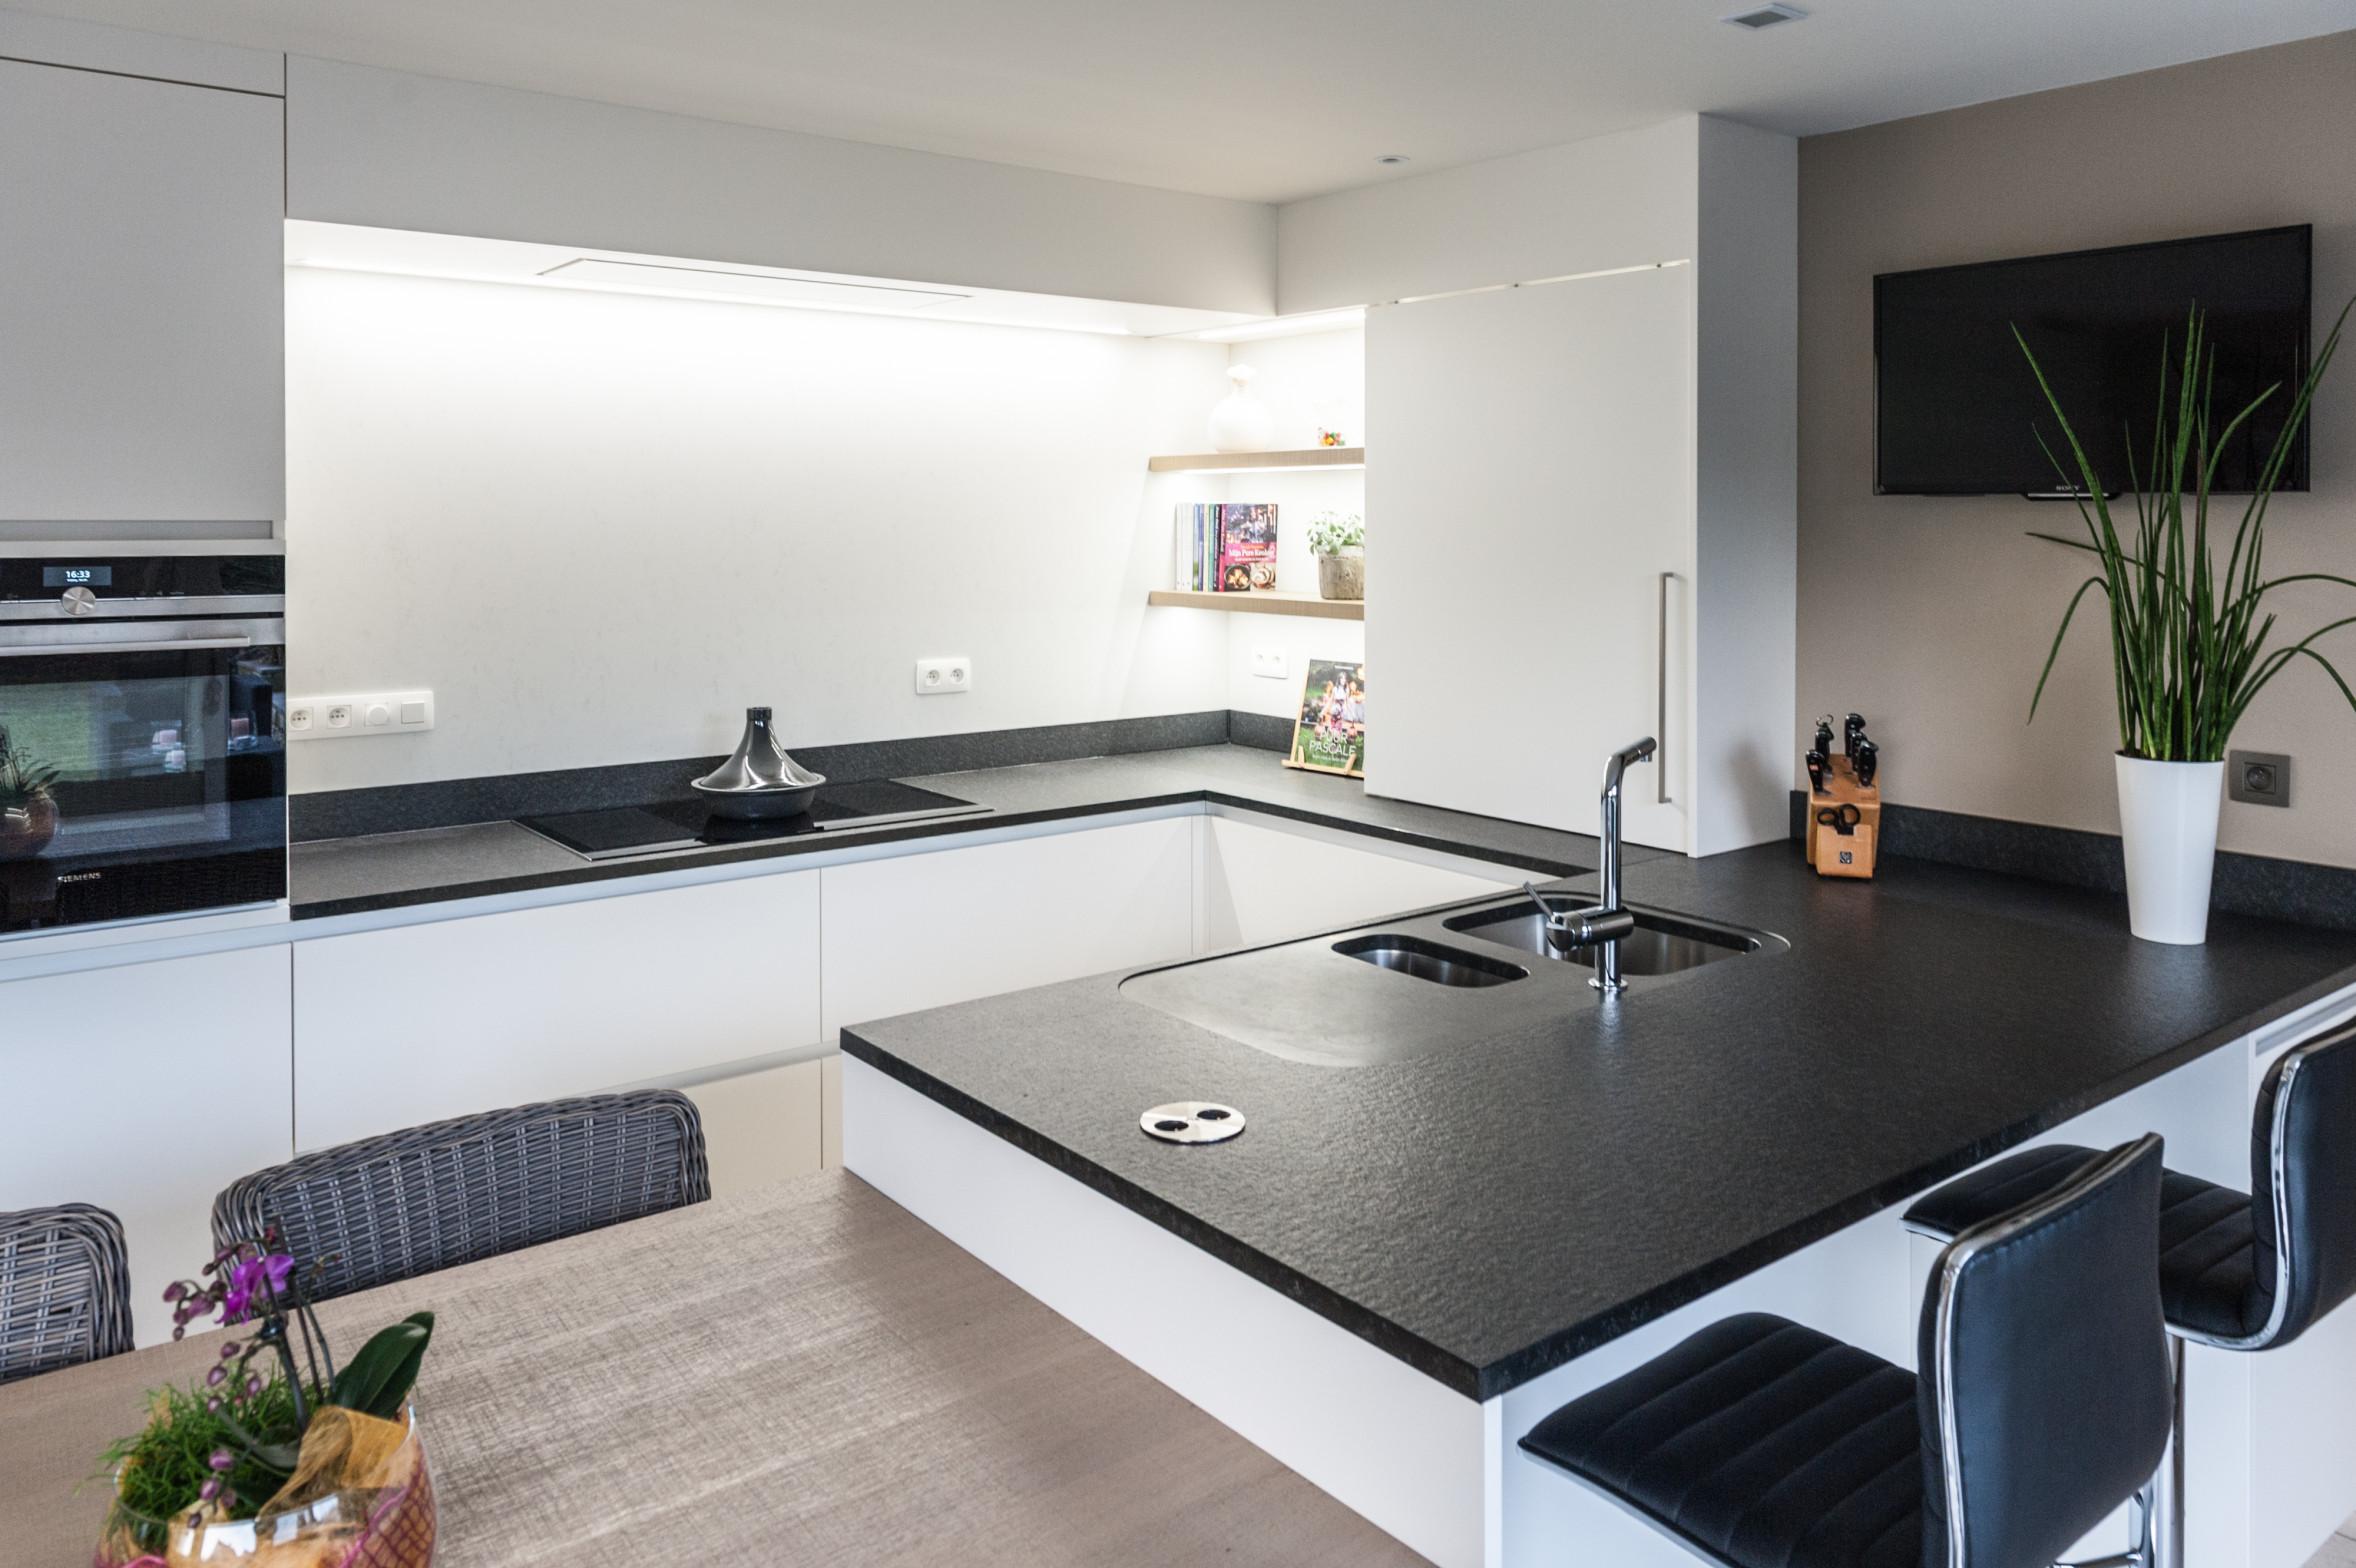 38 keuken wit zwart hout graniet modern zuid west vlaanderen.jpg